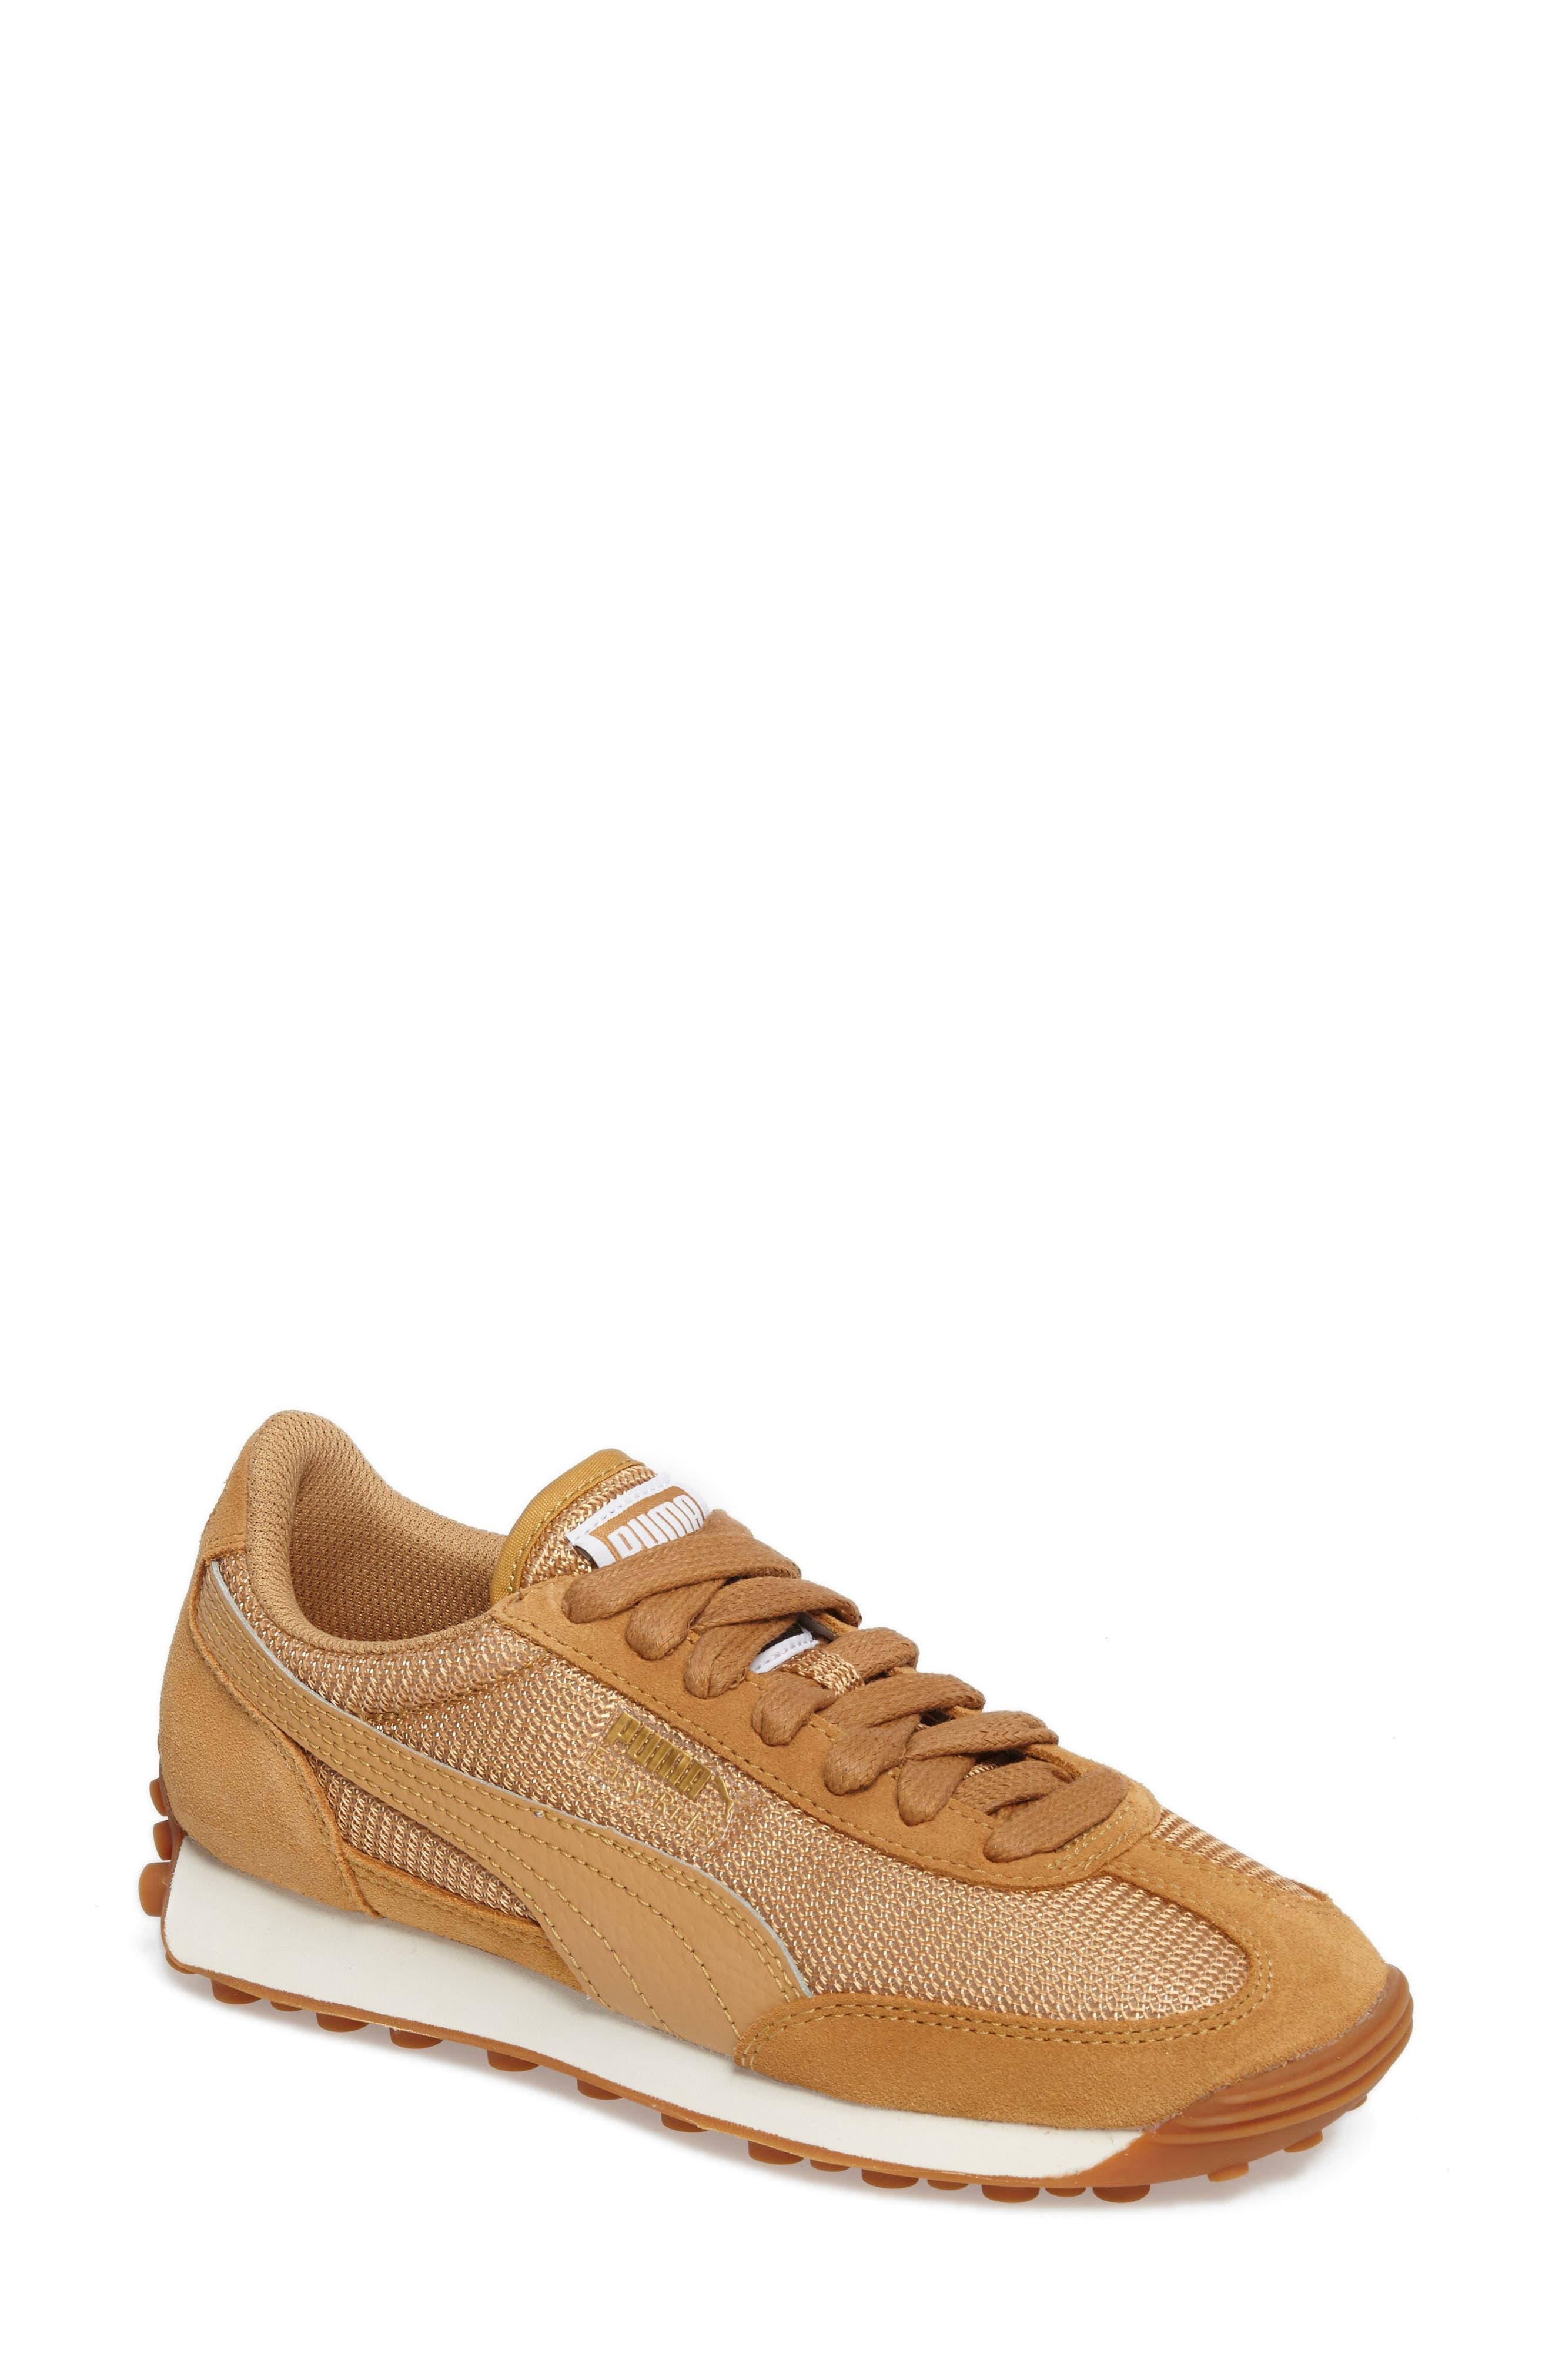 Easy Rider Sneaker,                         Main,                         color, 200